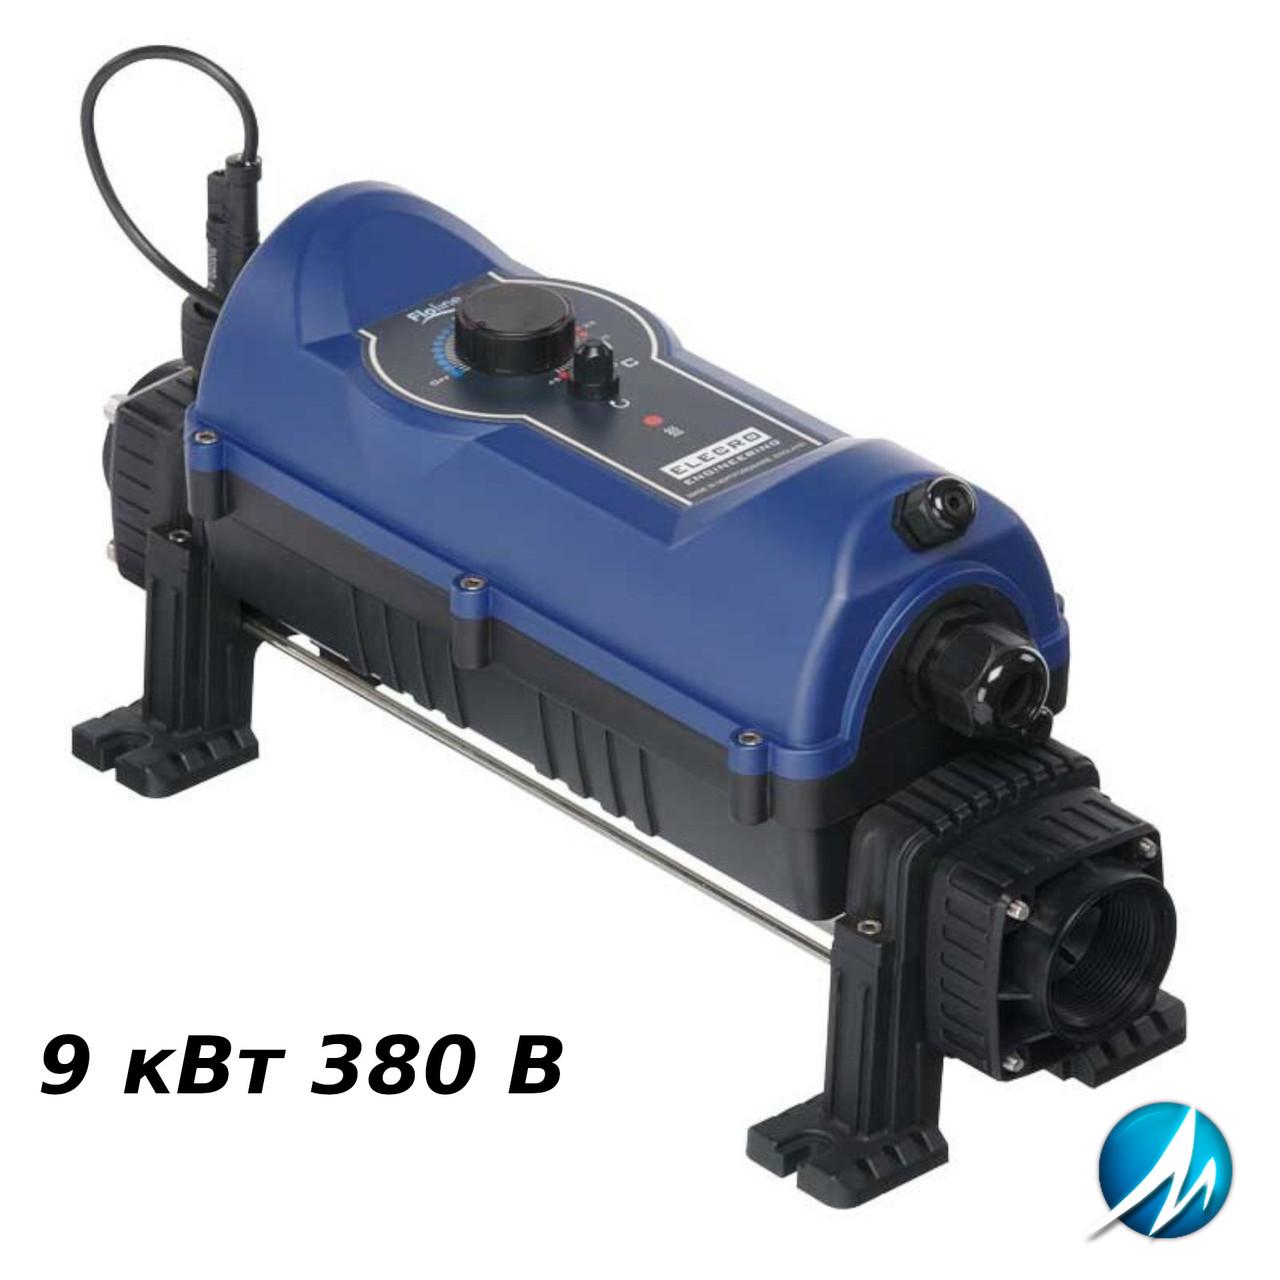 Електронагрівач Elecro Flowline 2 Titan 9кВт 380В